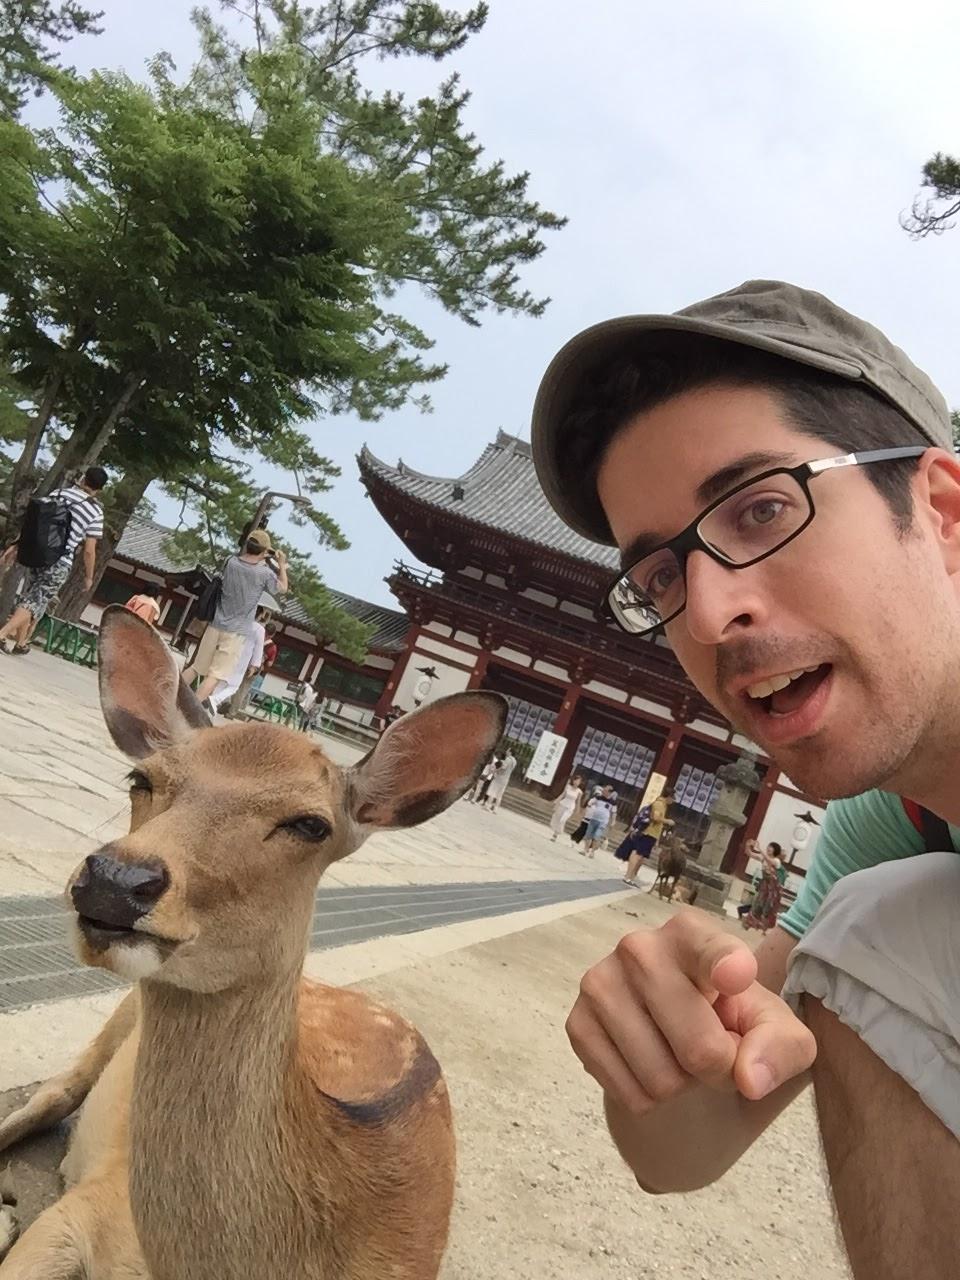 Nara's friend